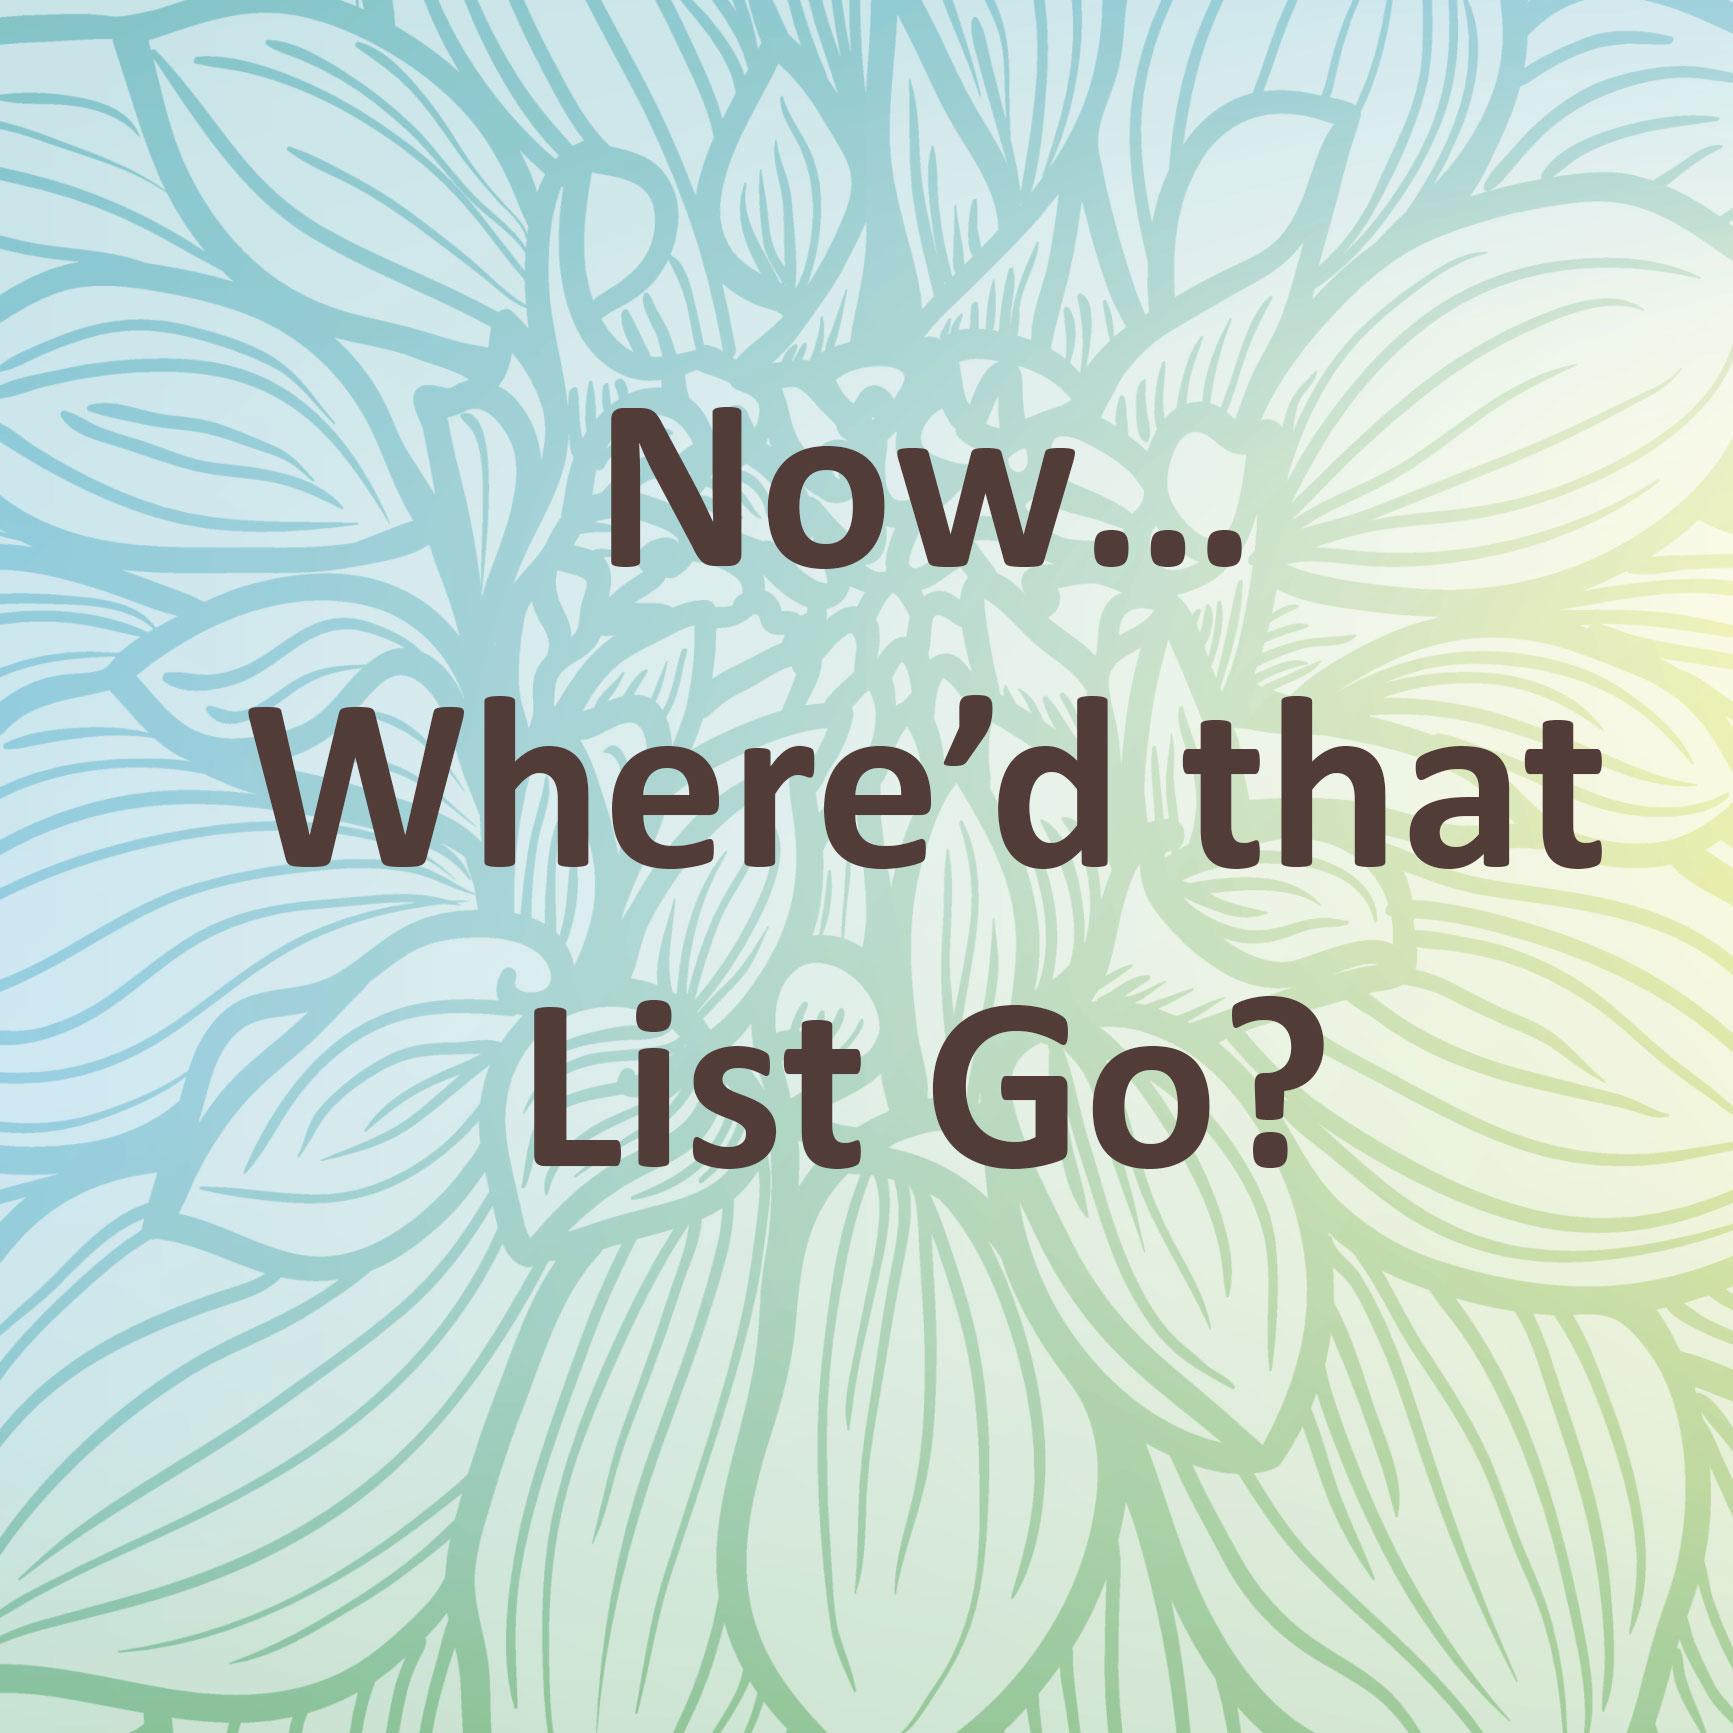 Now…Where'd that List Go?